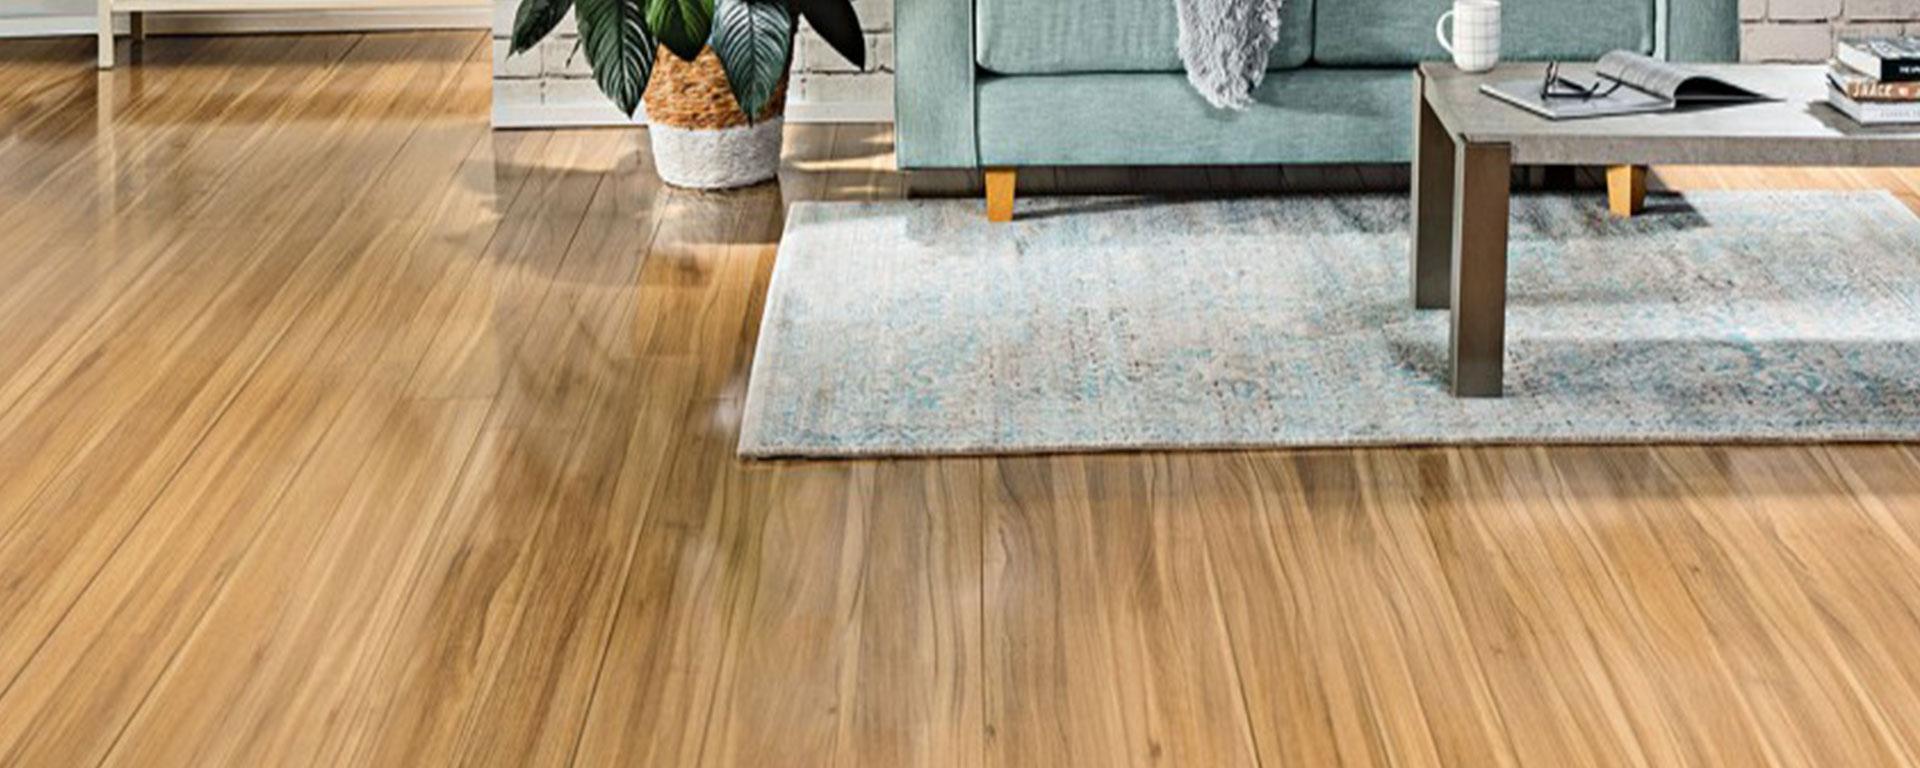 Timber flooring taren point